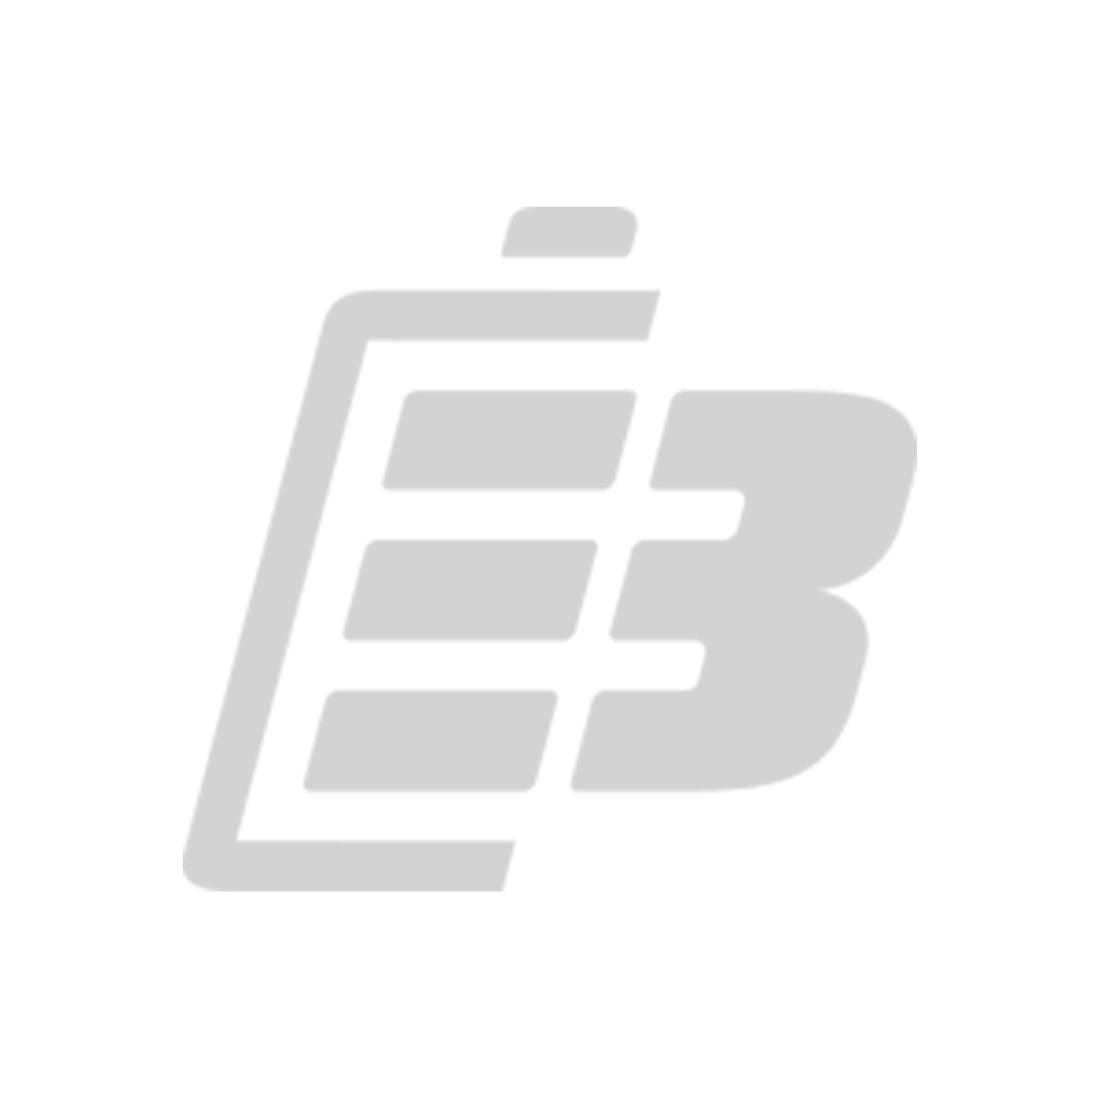 CR2032 Lithium battery Energizer 3V